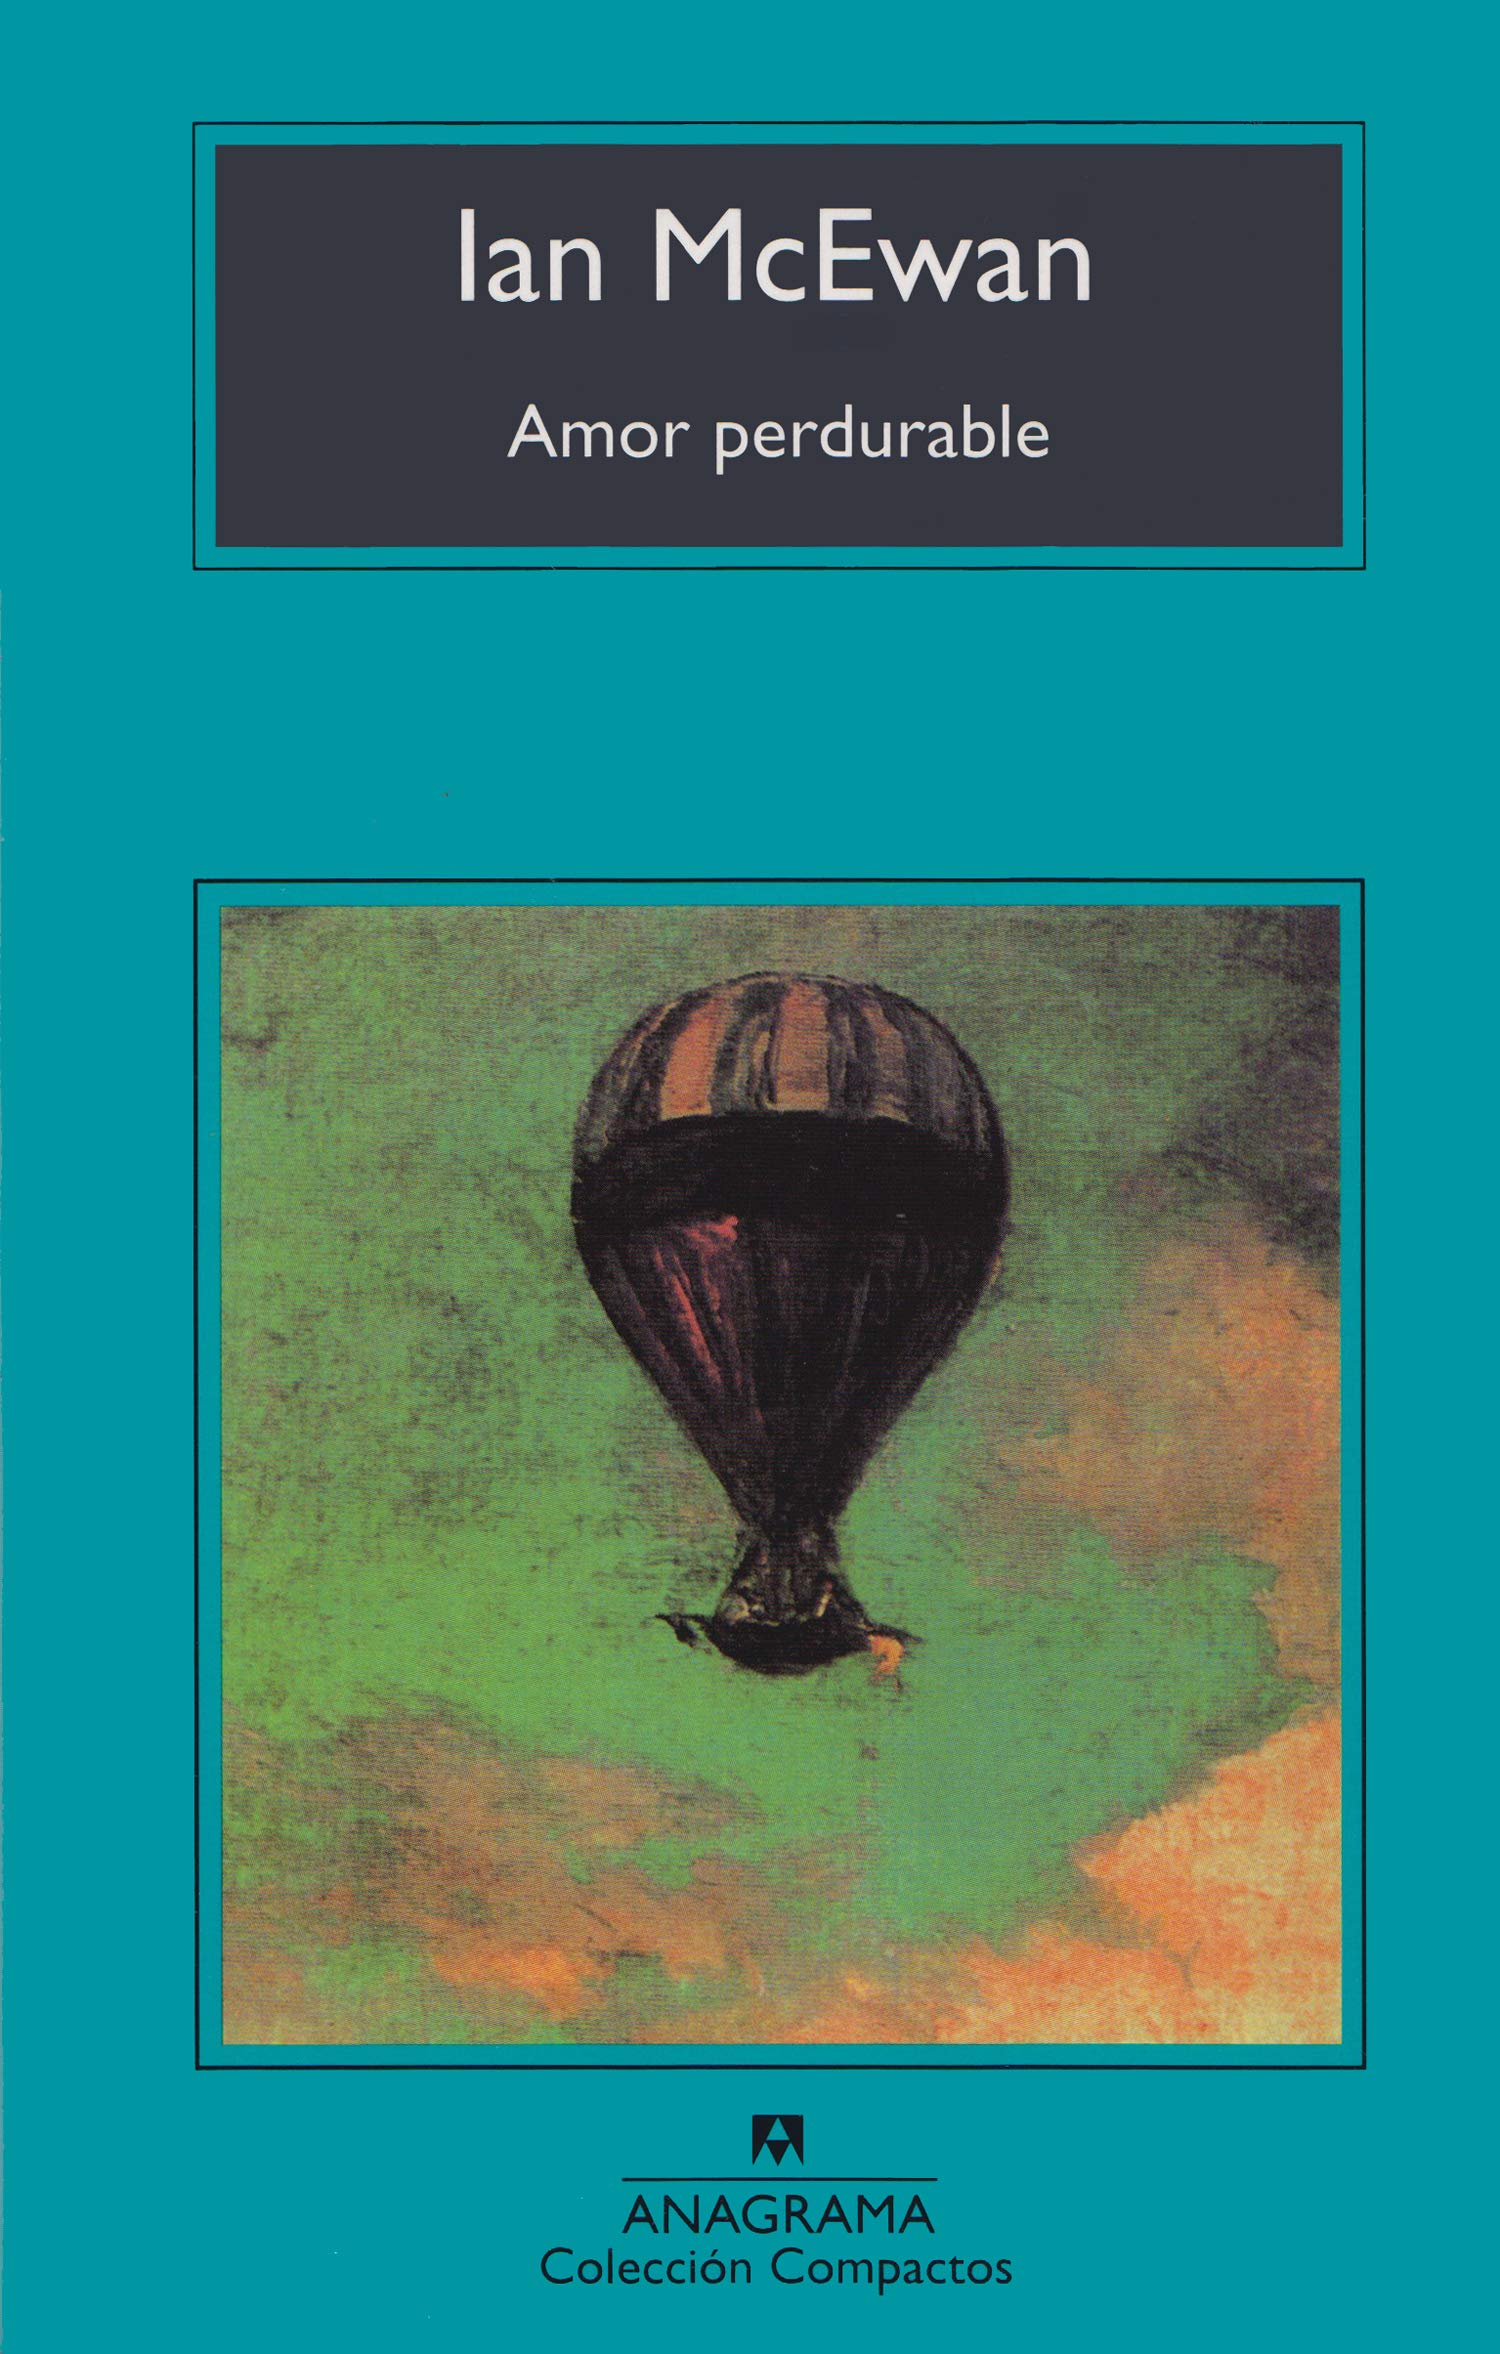 Libro Nocturno Hindu (9 Ed) Antonio Tabucchi epub - espsychalear